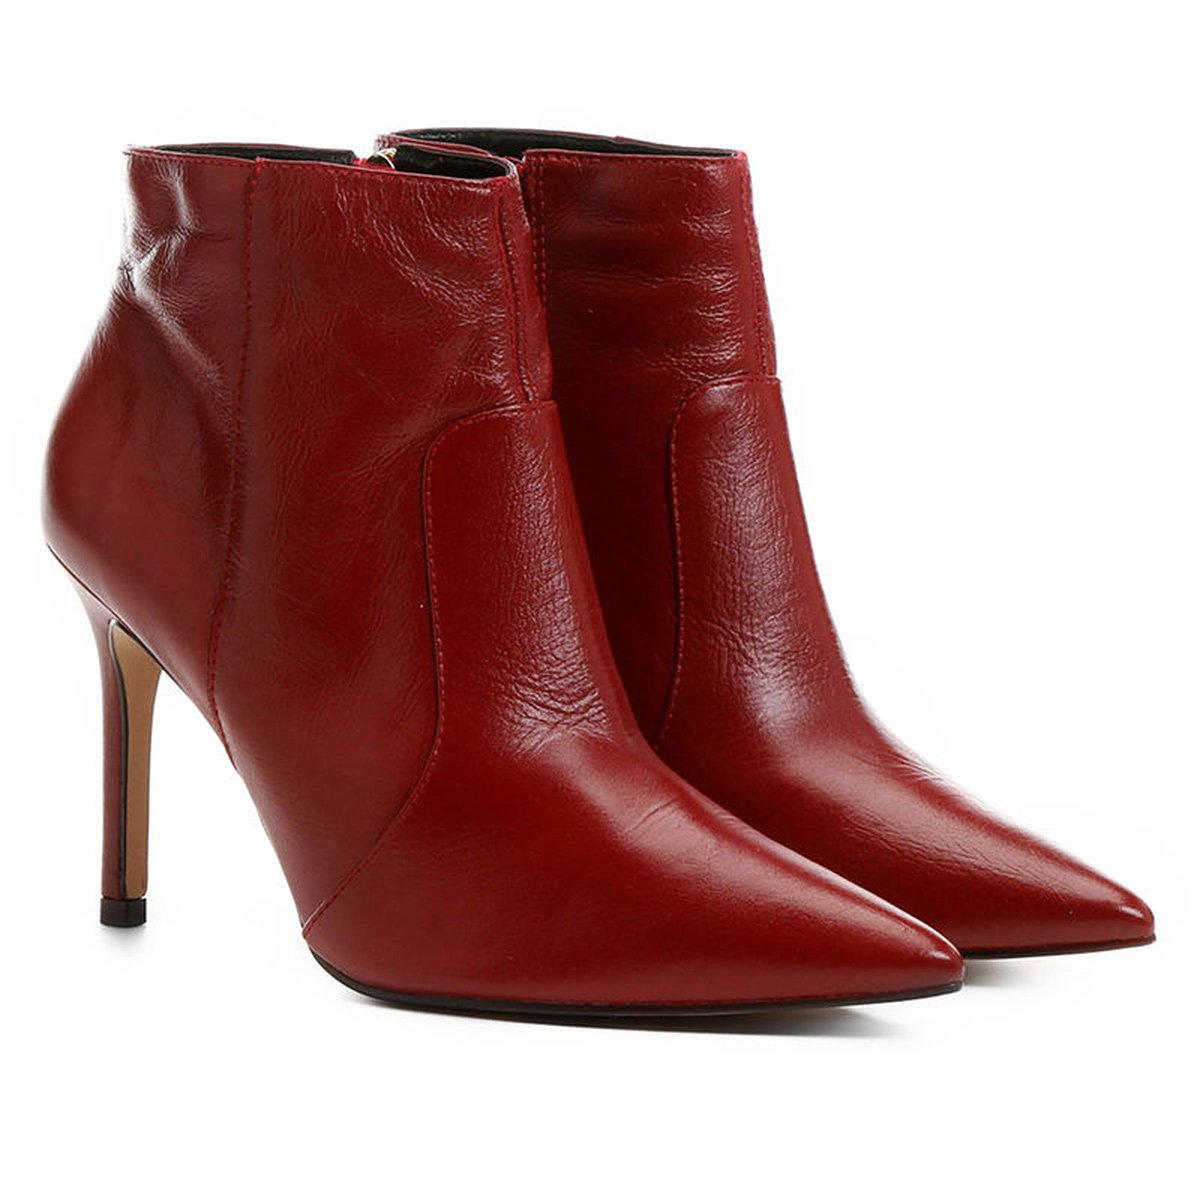 5b86a5133c Bota Couro Shoestock Curta Salto Fino Feminina - Compre Agora ...